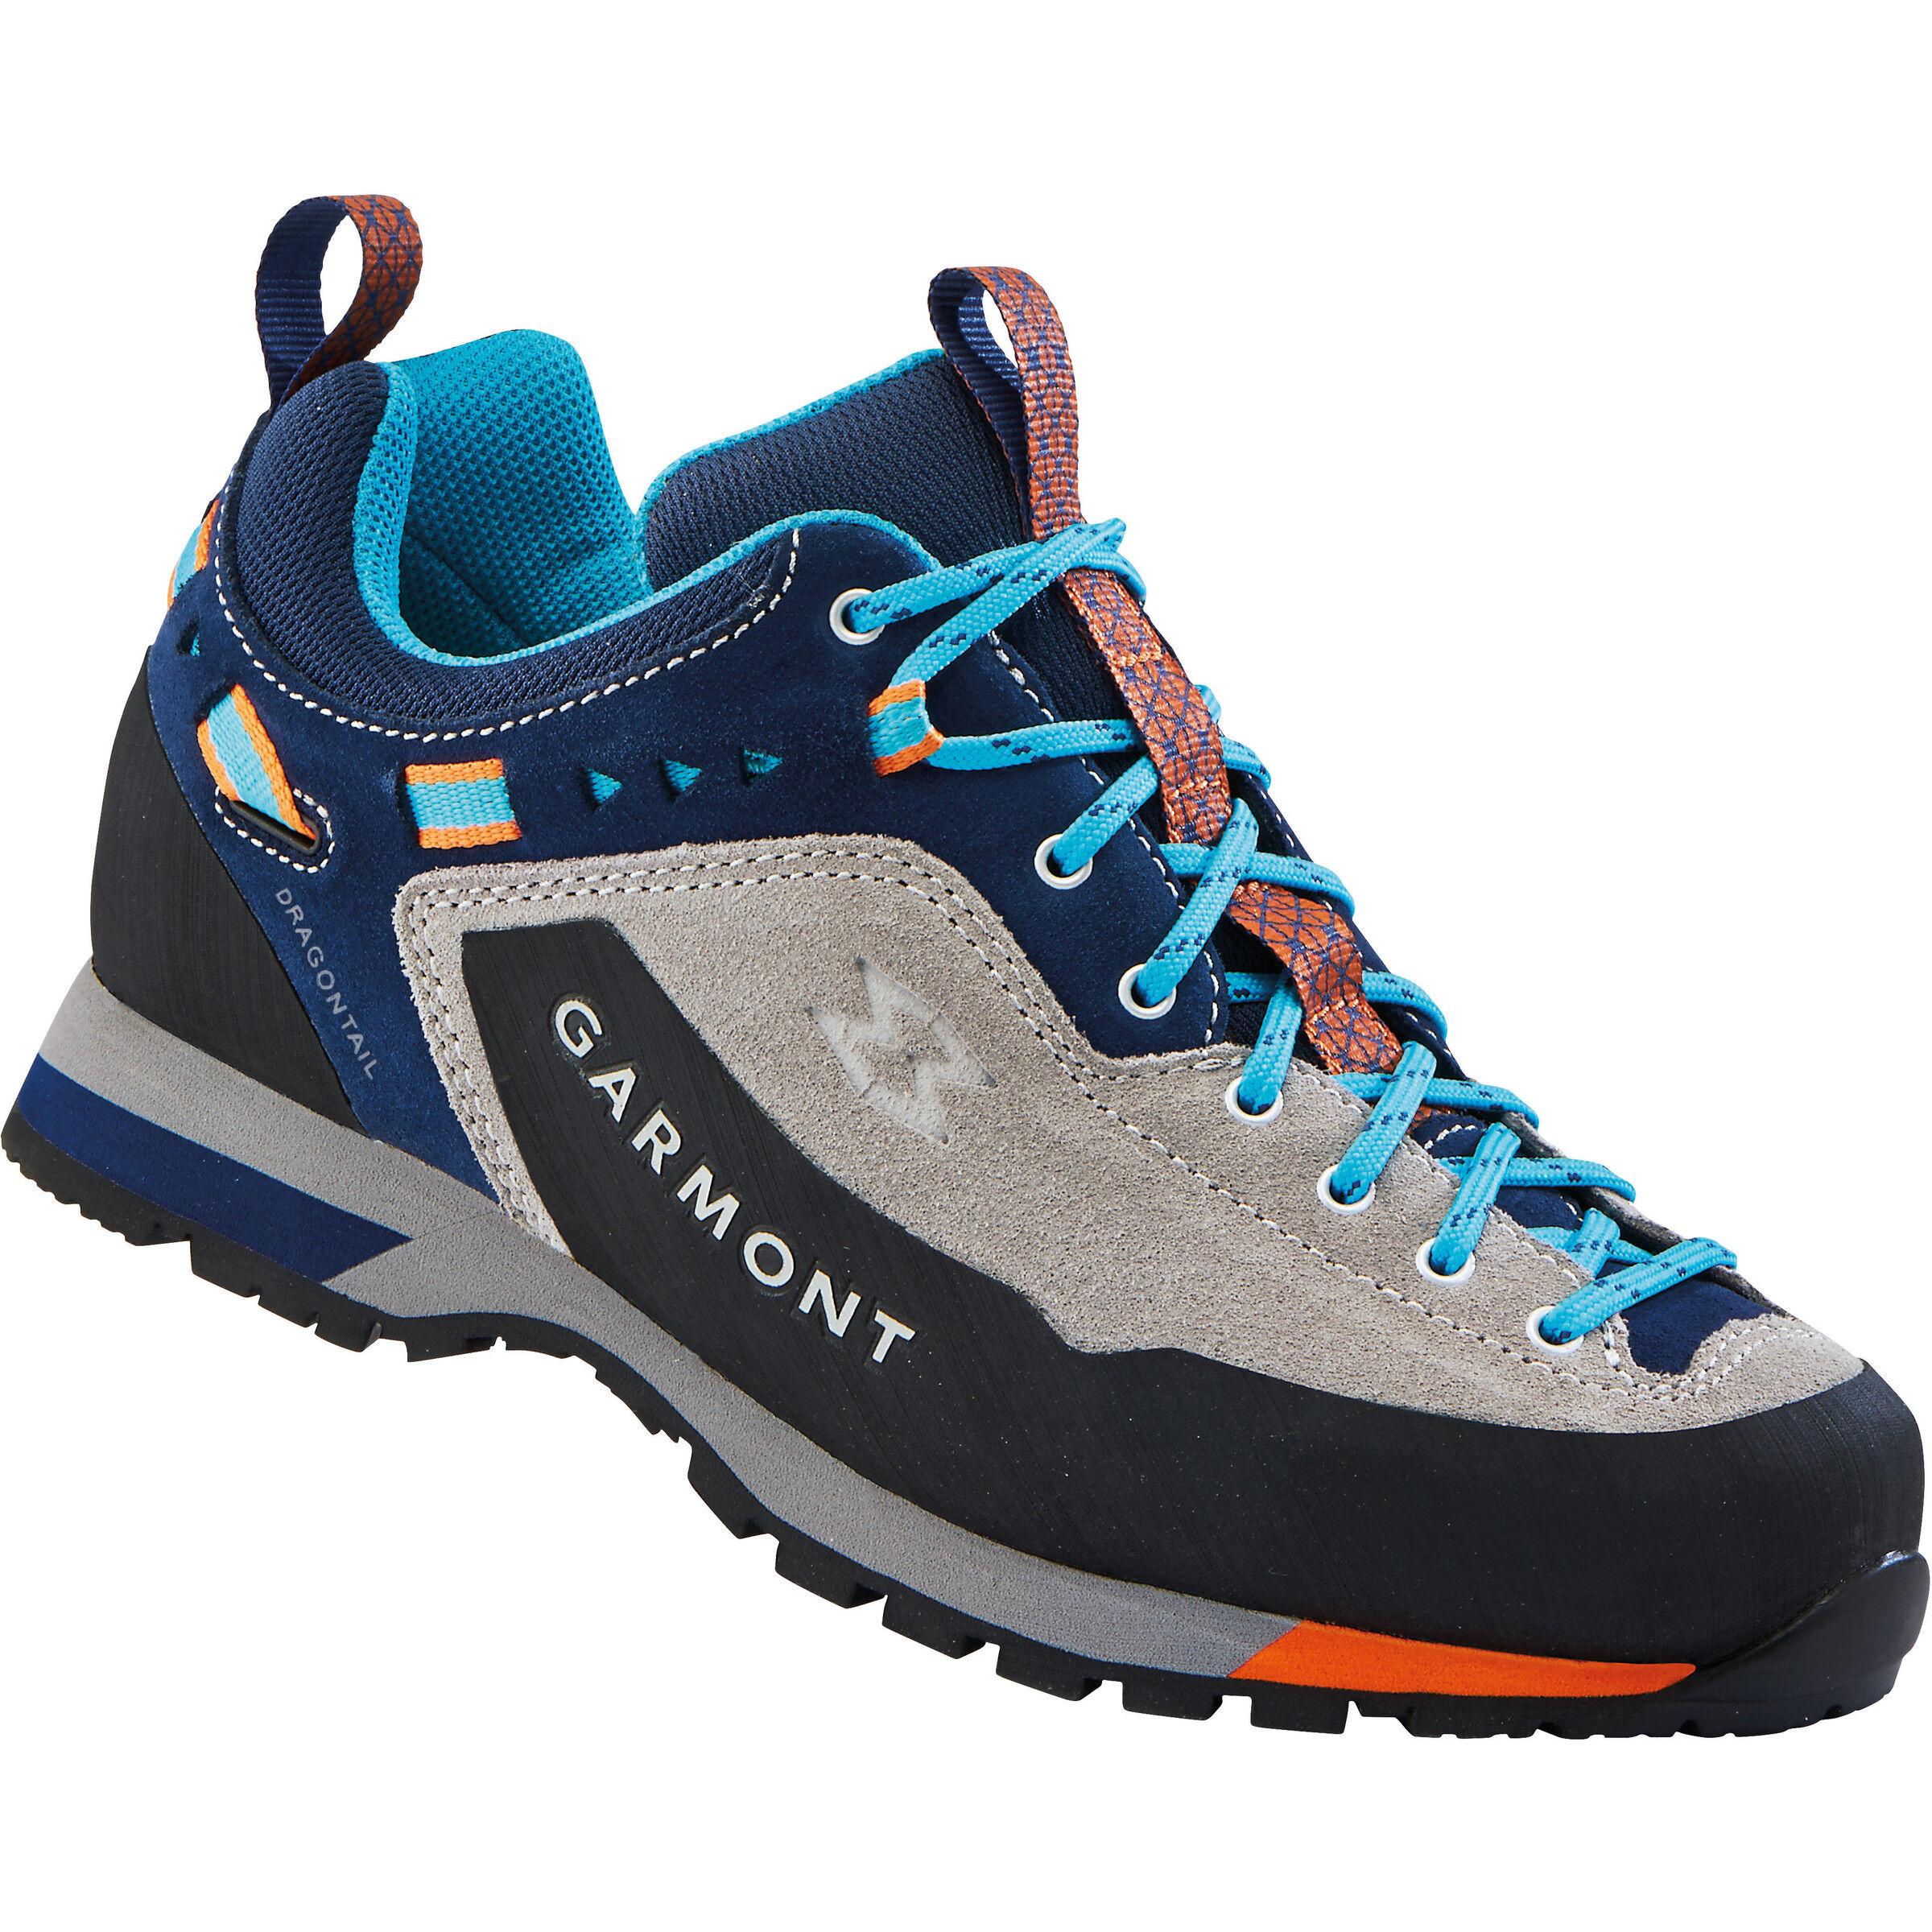 Garmont Dragontail LT Shoes Dam dark greyorange